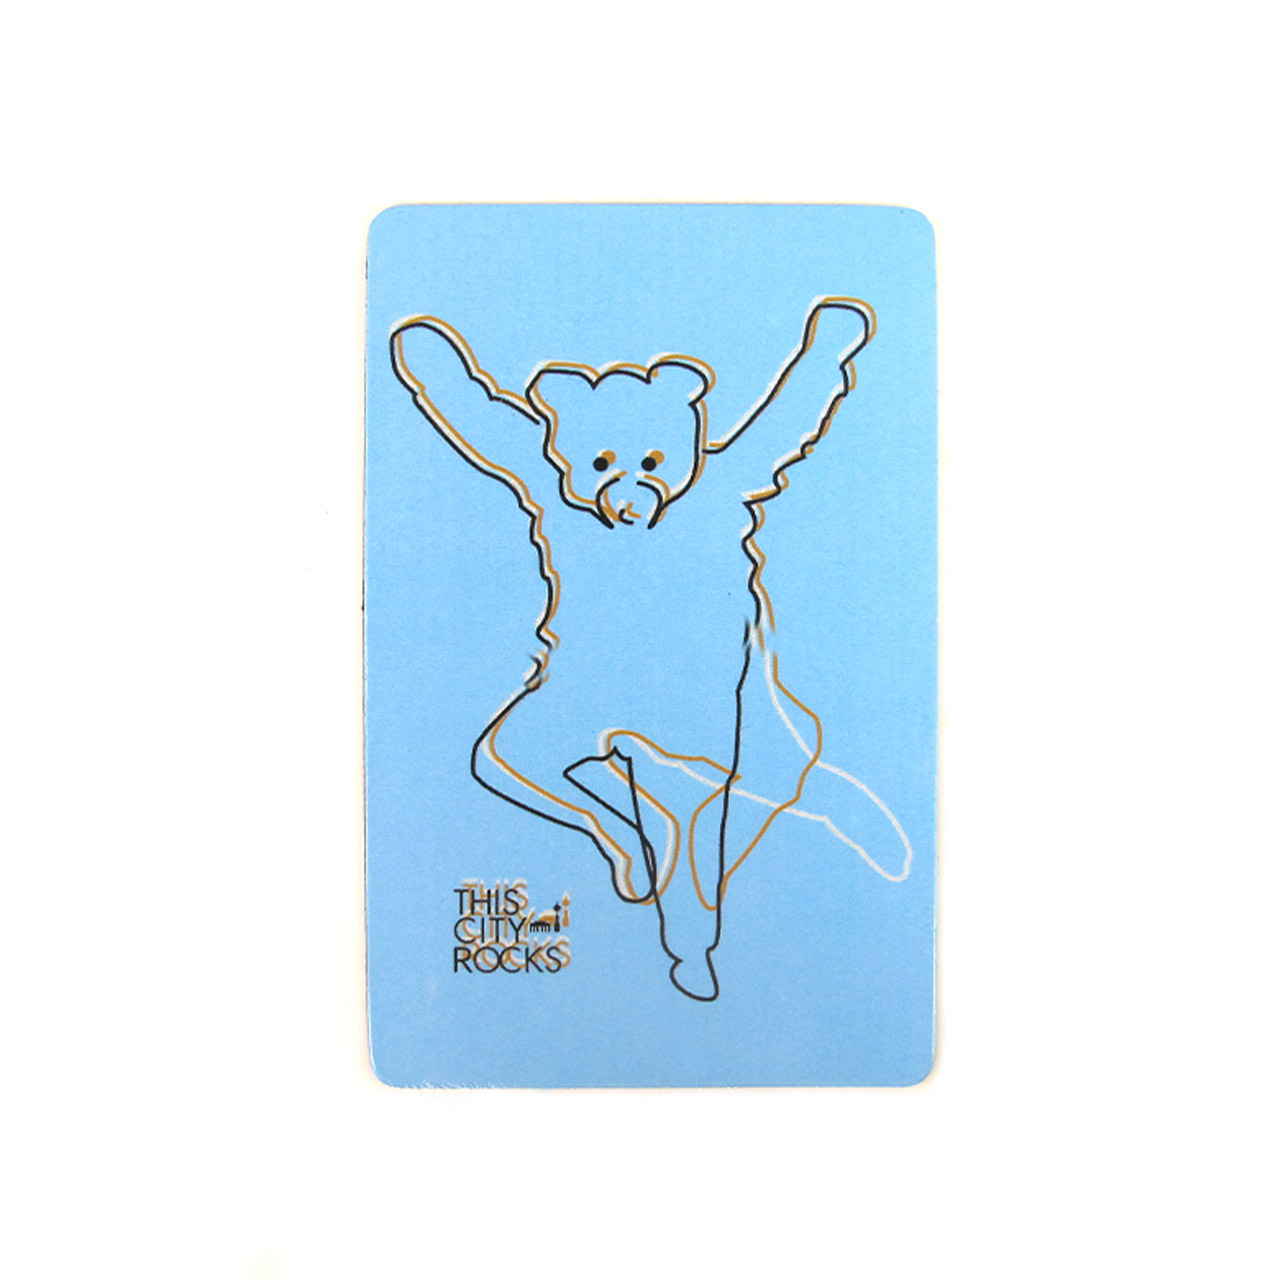 Berlinmagnet tanzender Bär blau